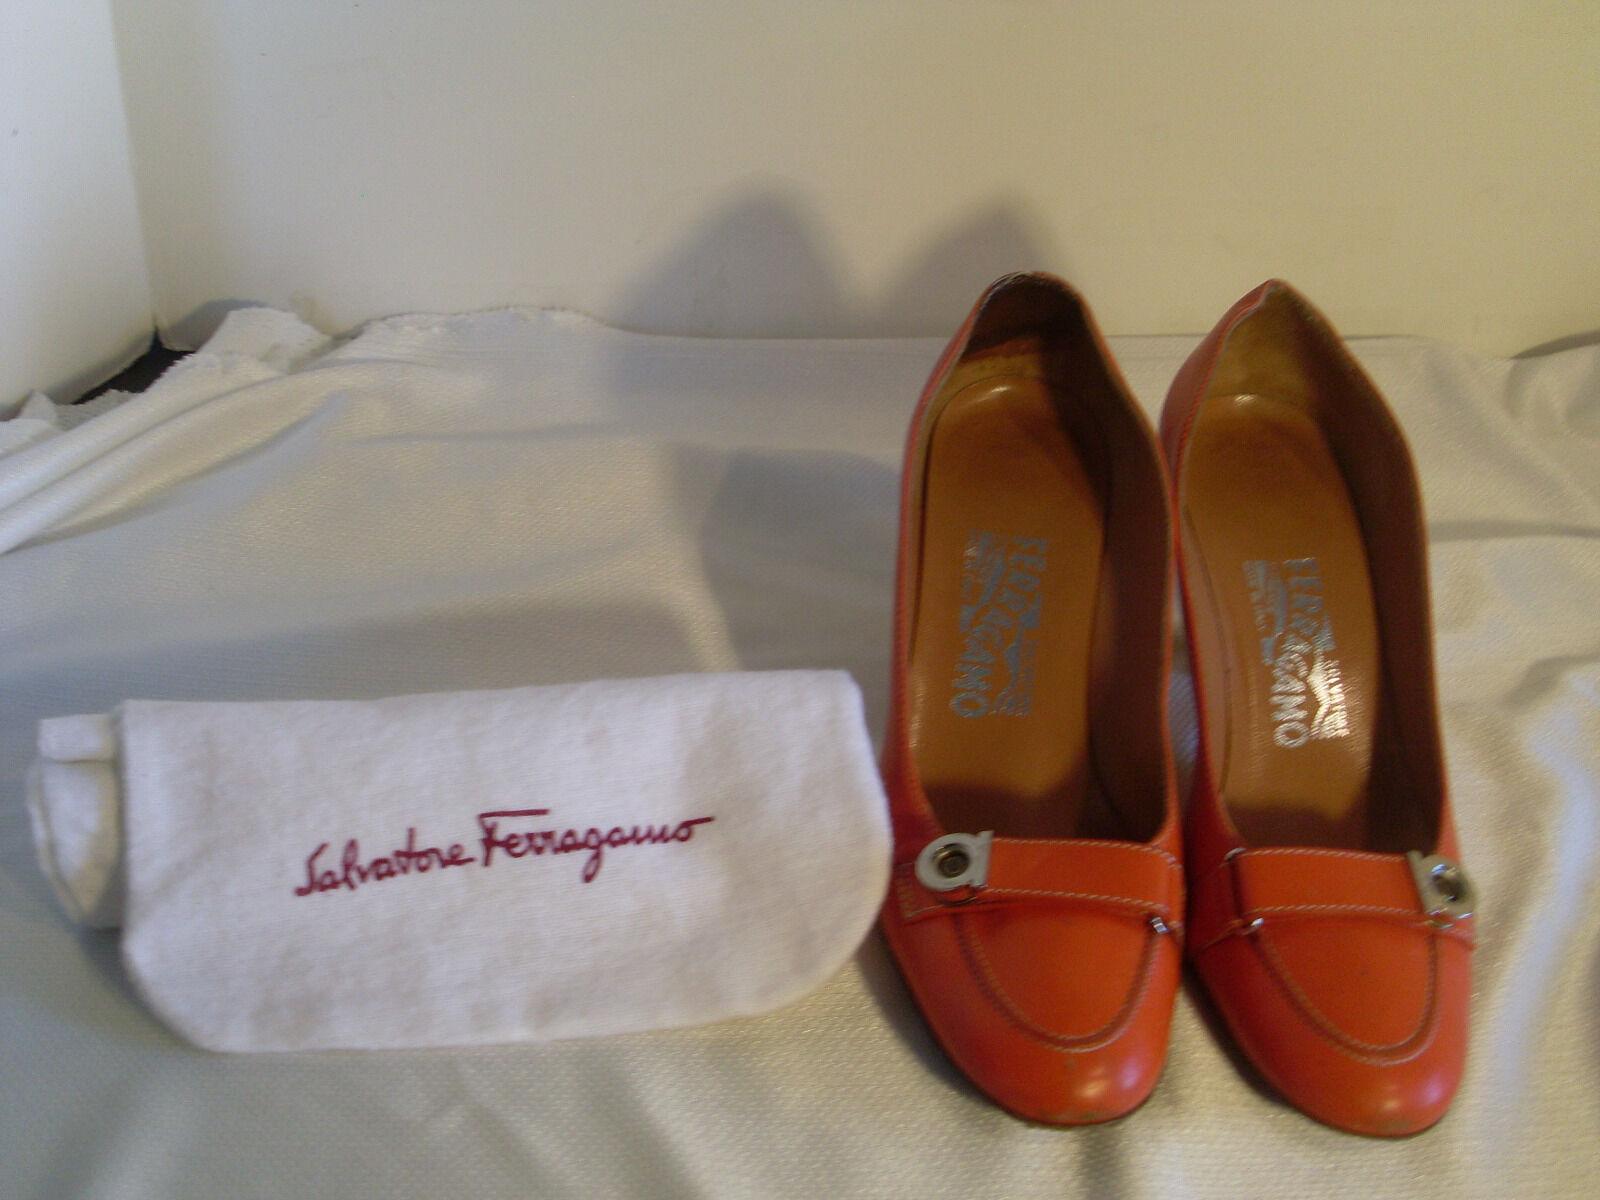 SALVATORE FERRAGAMO ORANGE LEATHER CLOTH WOOD HEEL W/GANCINI ACCENT & CLOTH LEATHER BAG#31 d9a384